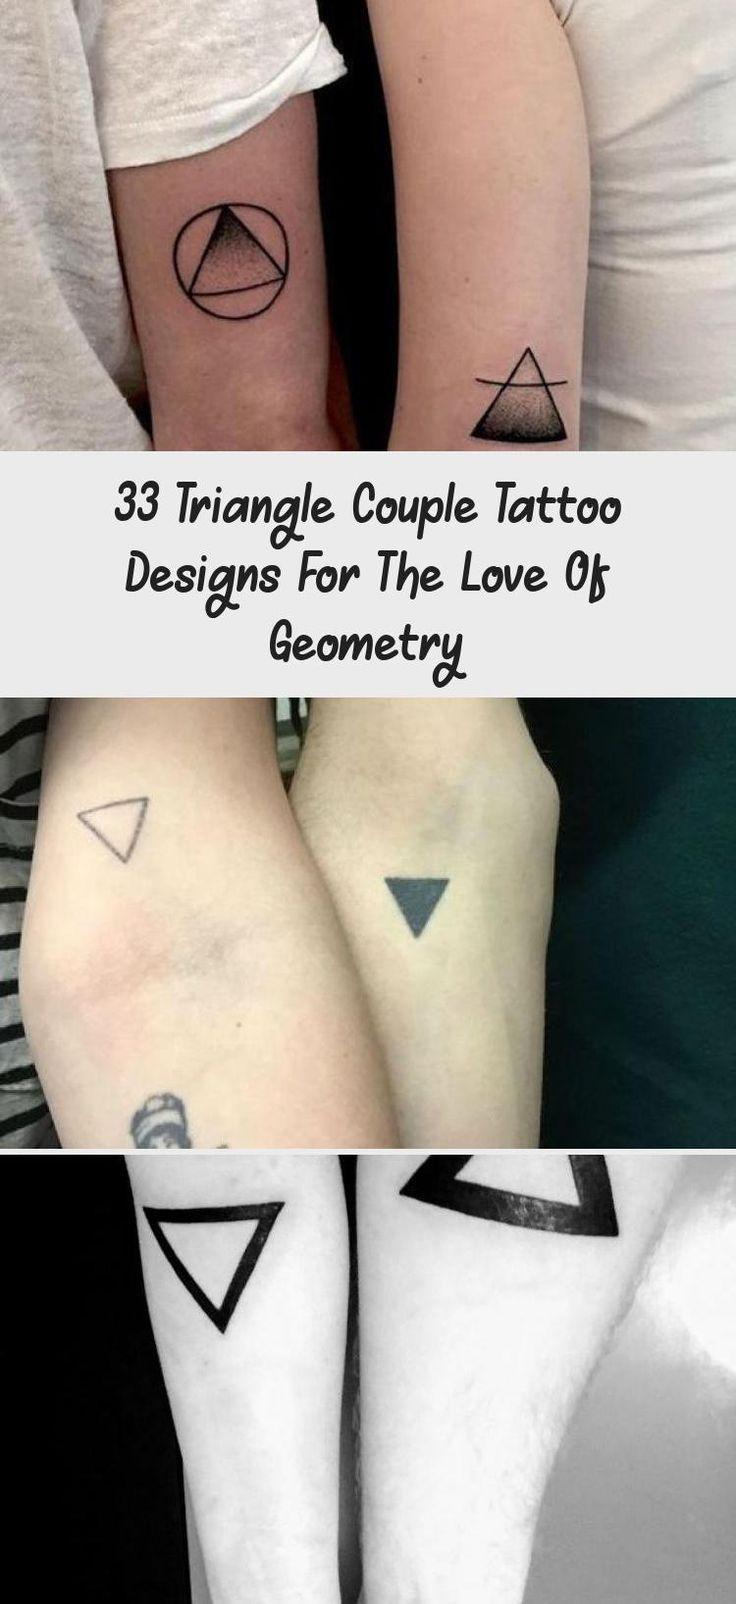 10+ Best Love symbol tattoos photos image ideas